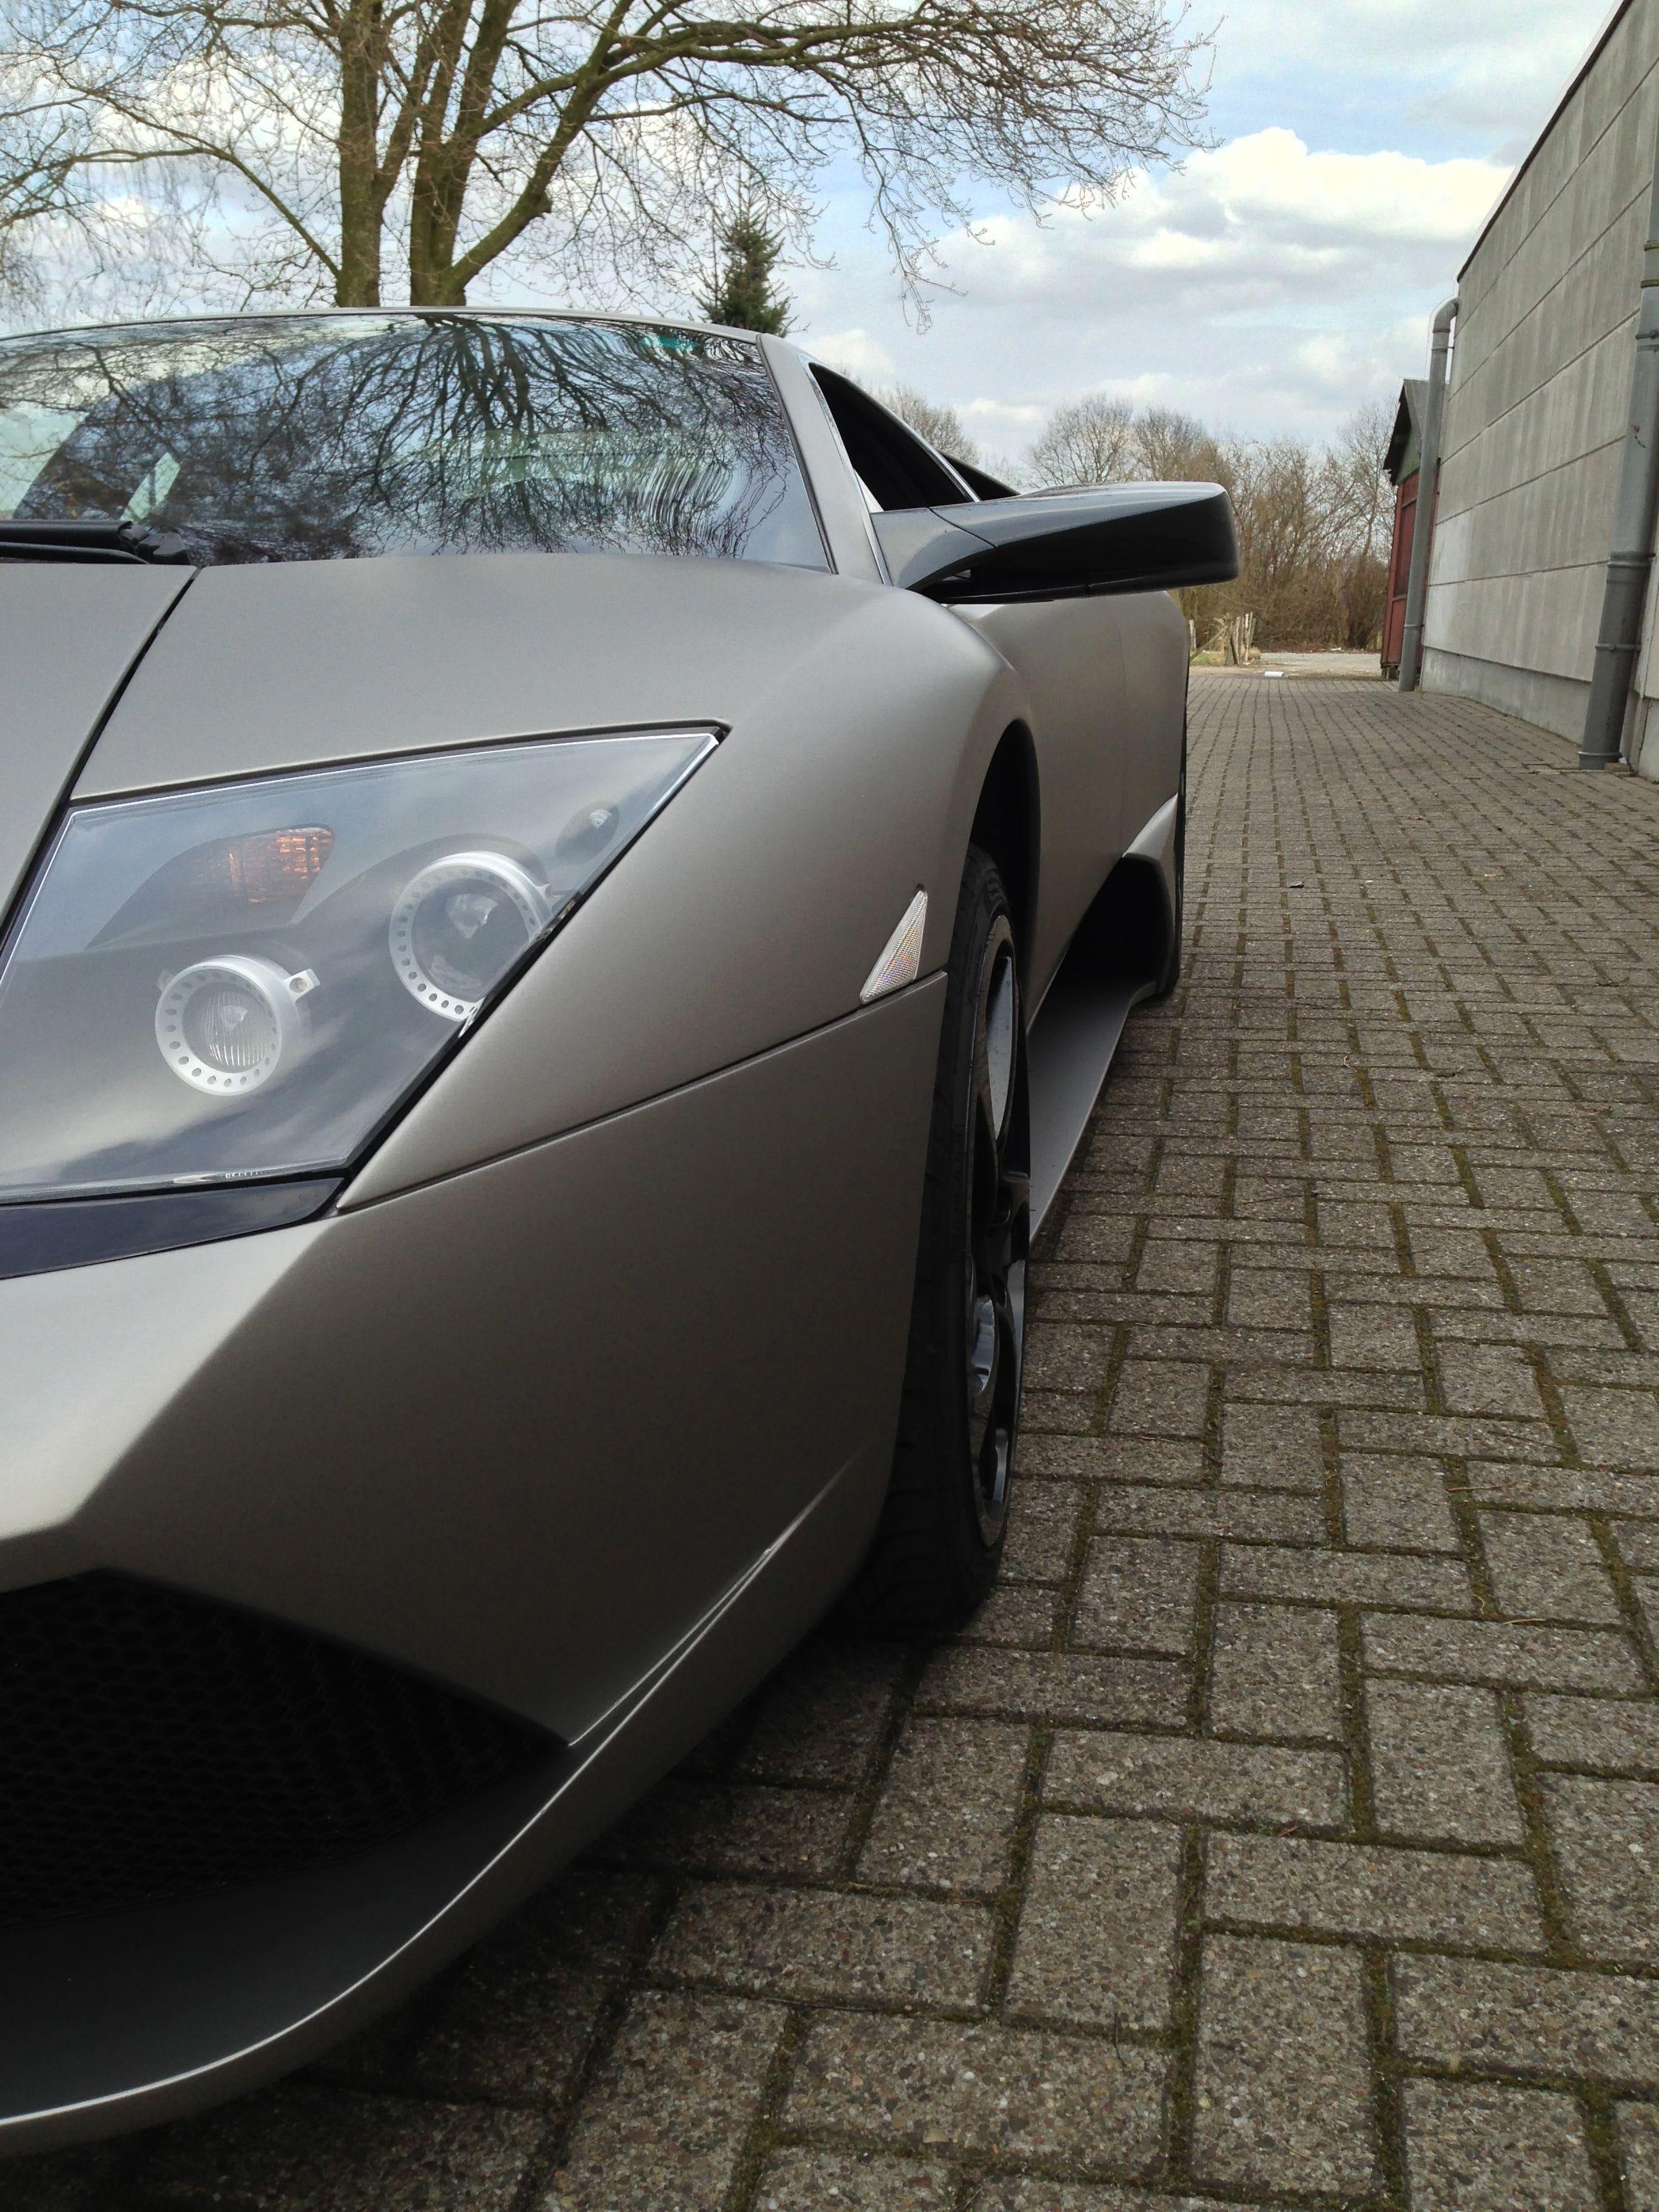 Lamborghini Murcialago LP670 met Gunpowder Wrap, Carwrapping door Wrapmyride.nu Foto-nr:5975, ©2021